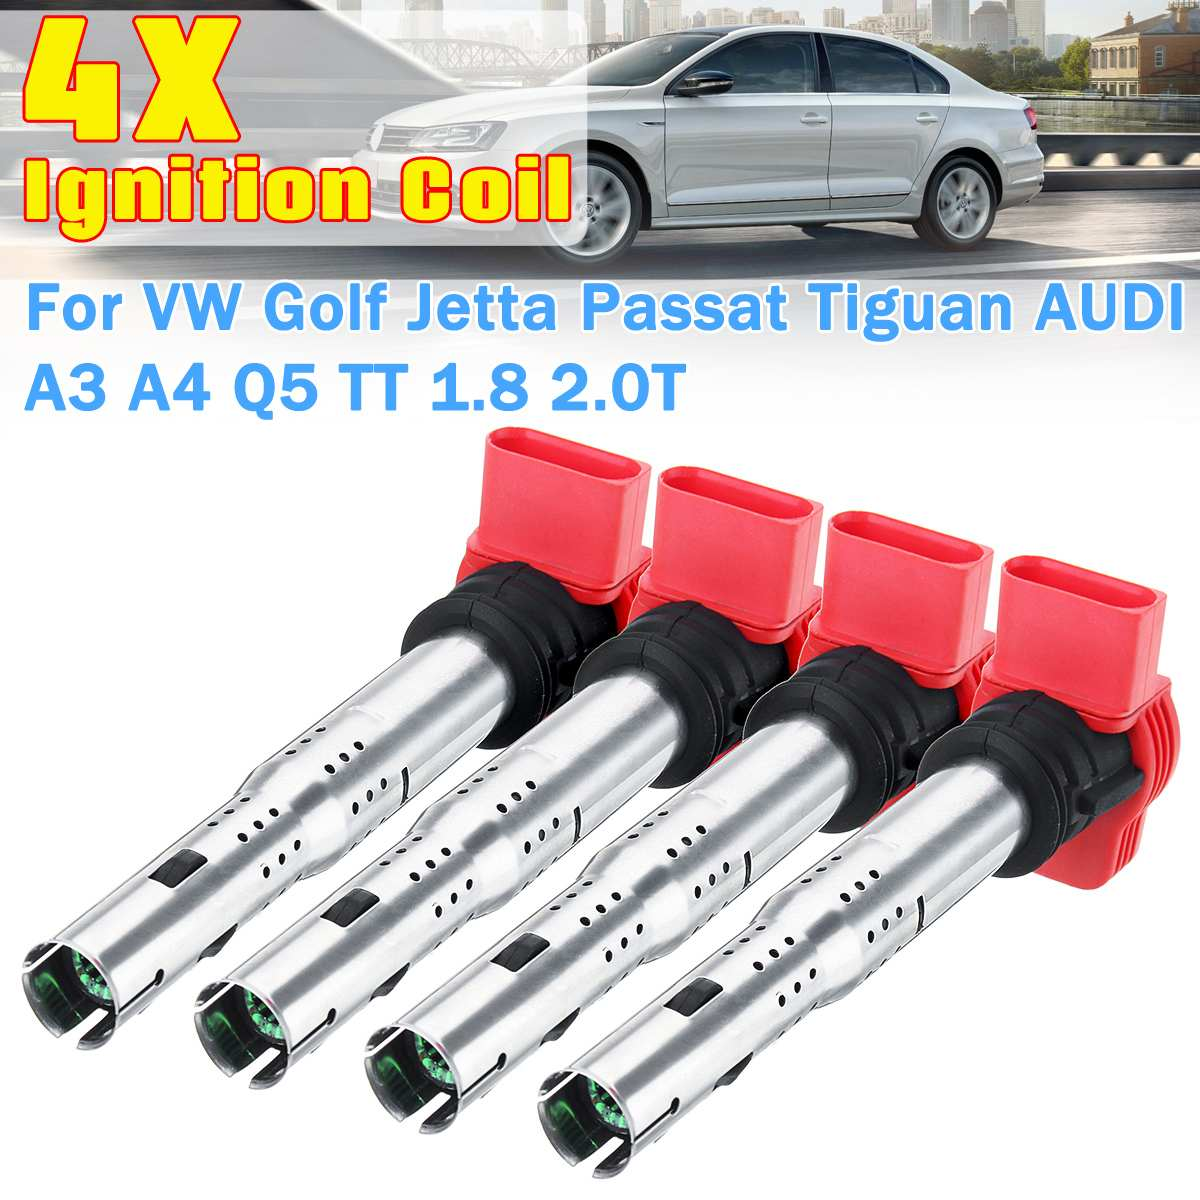 4Pcs 06E905115A/B/C/D/E Universal Zündspule für VW für Golf für Jetta für Passat für Tiguan für AUDI A3 A4 Q5 TT 1,8 2,0 T